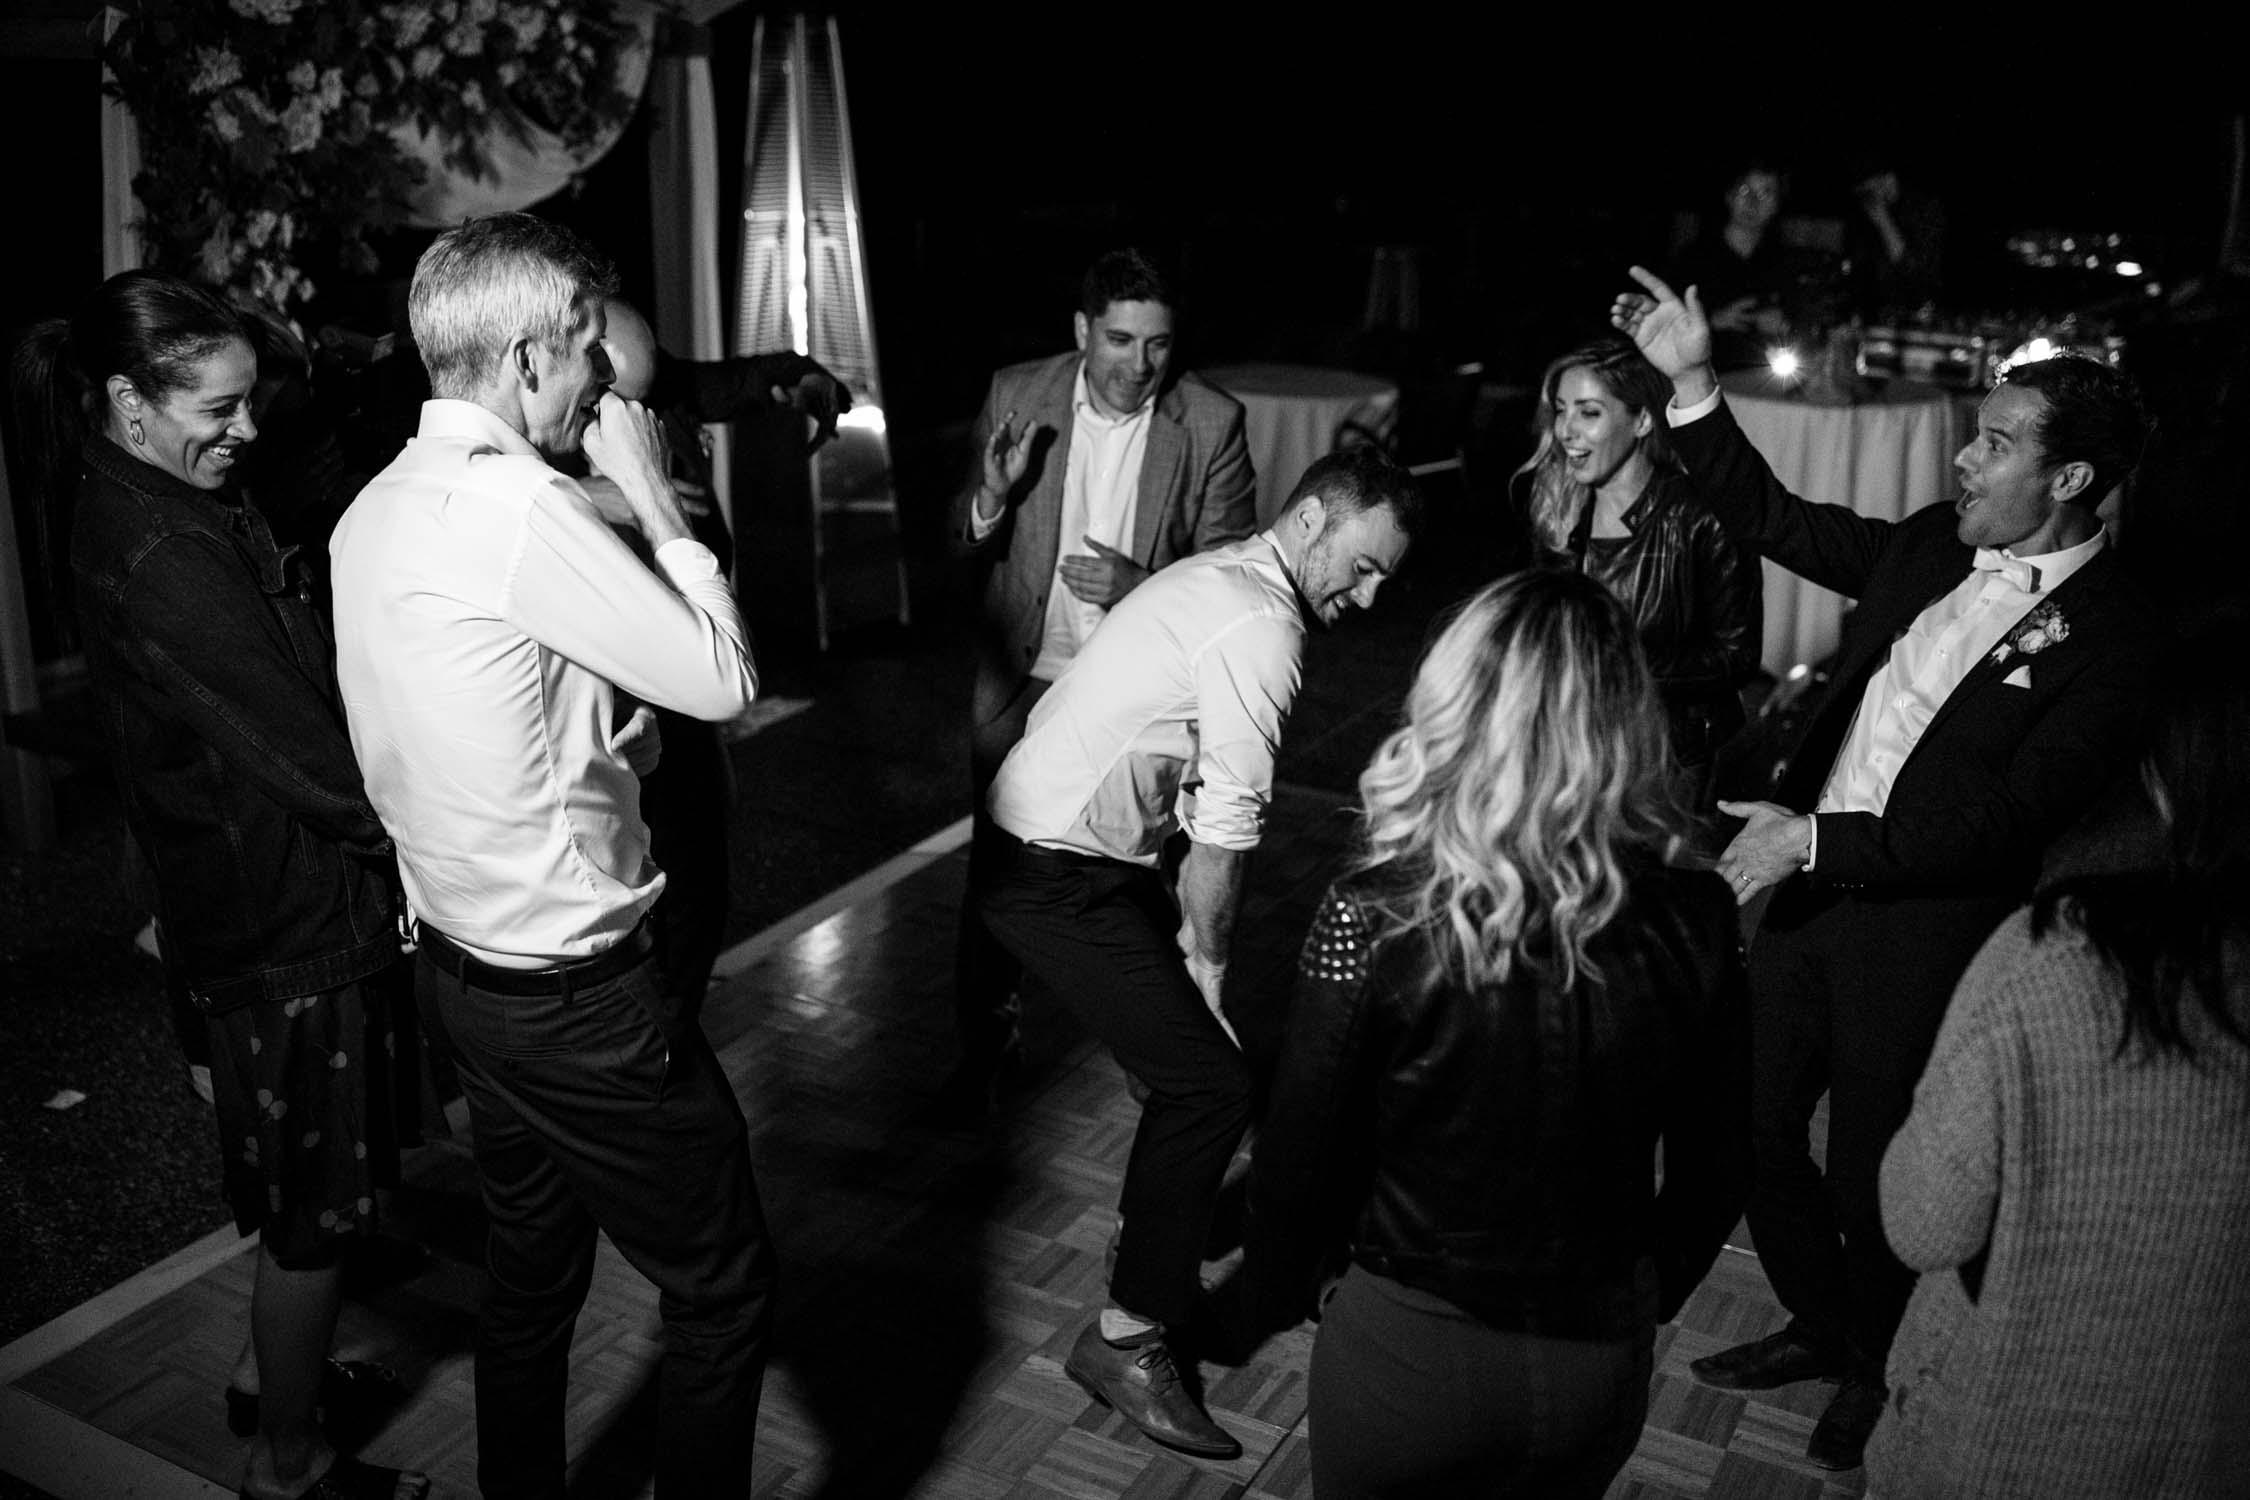 Classic Epic Funny Wedding Dancing Photos